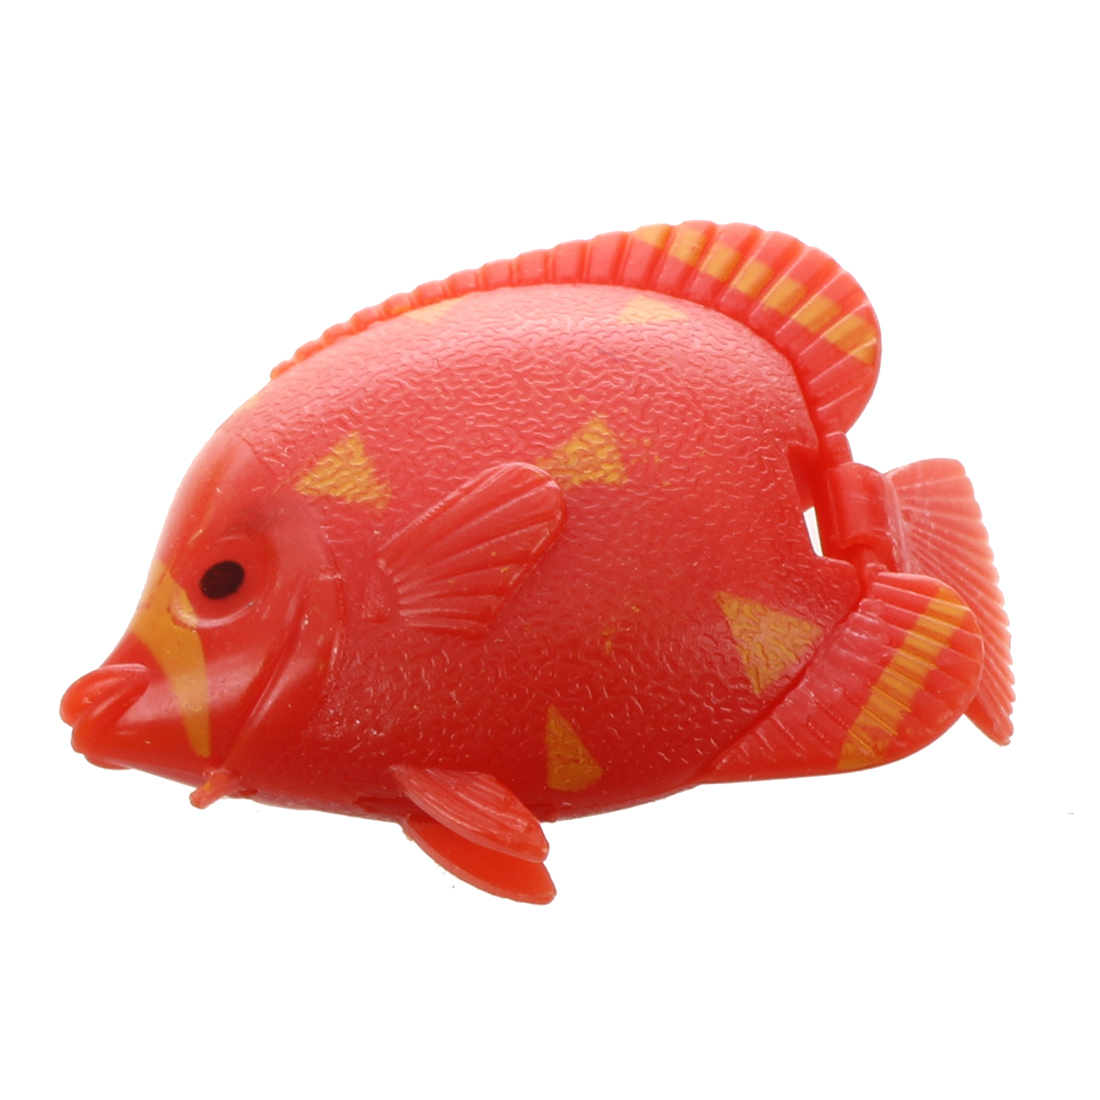 He aquarium artificial movable tail swimming fish 5 pcs for Fake fish that swim